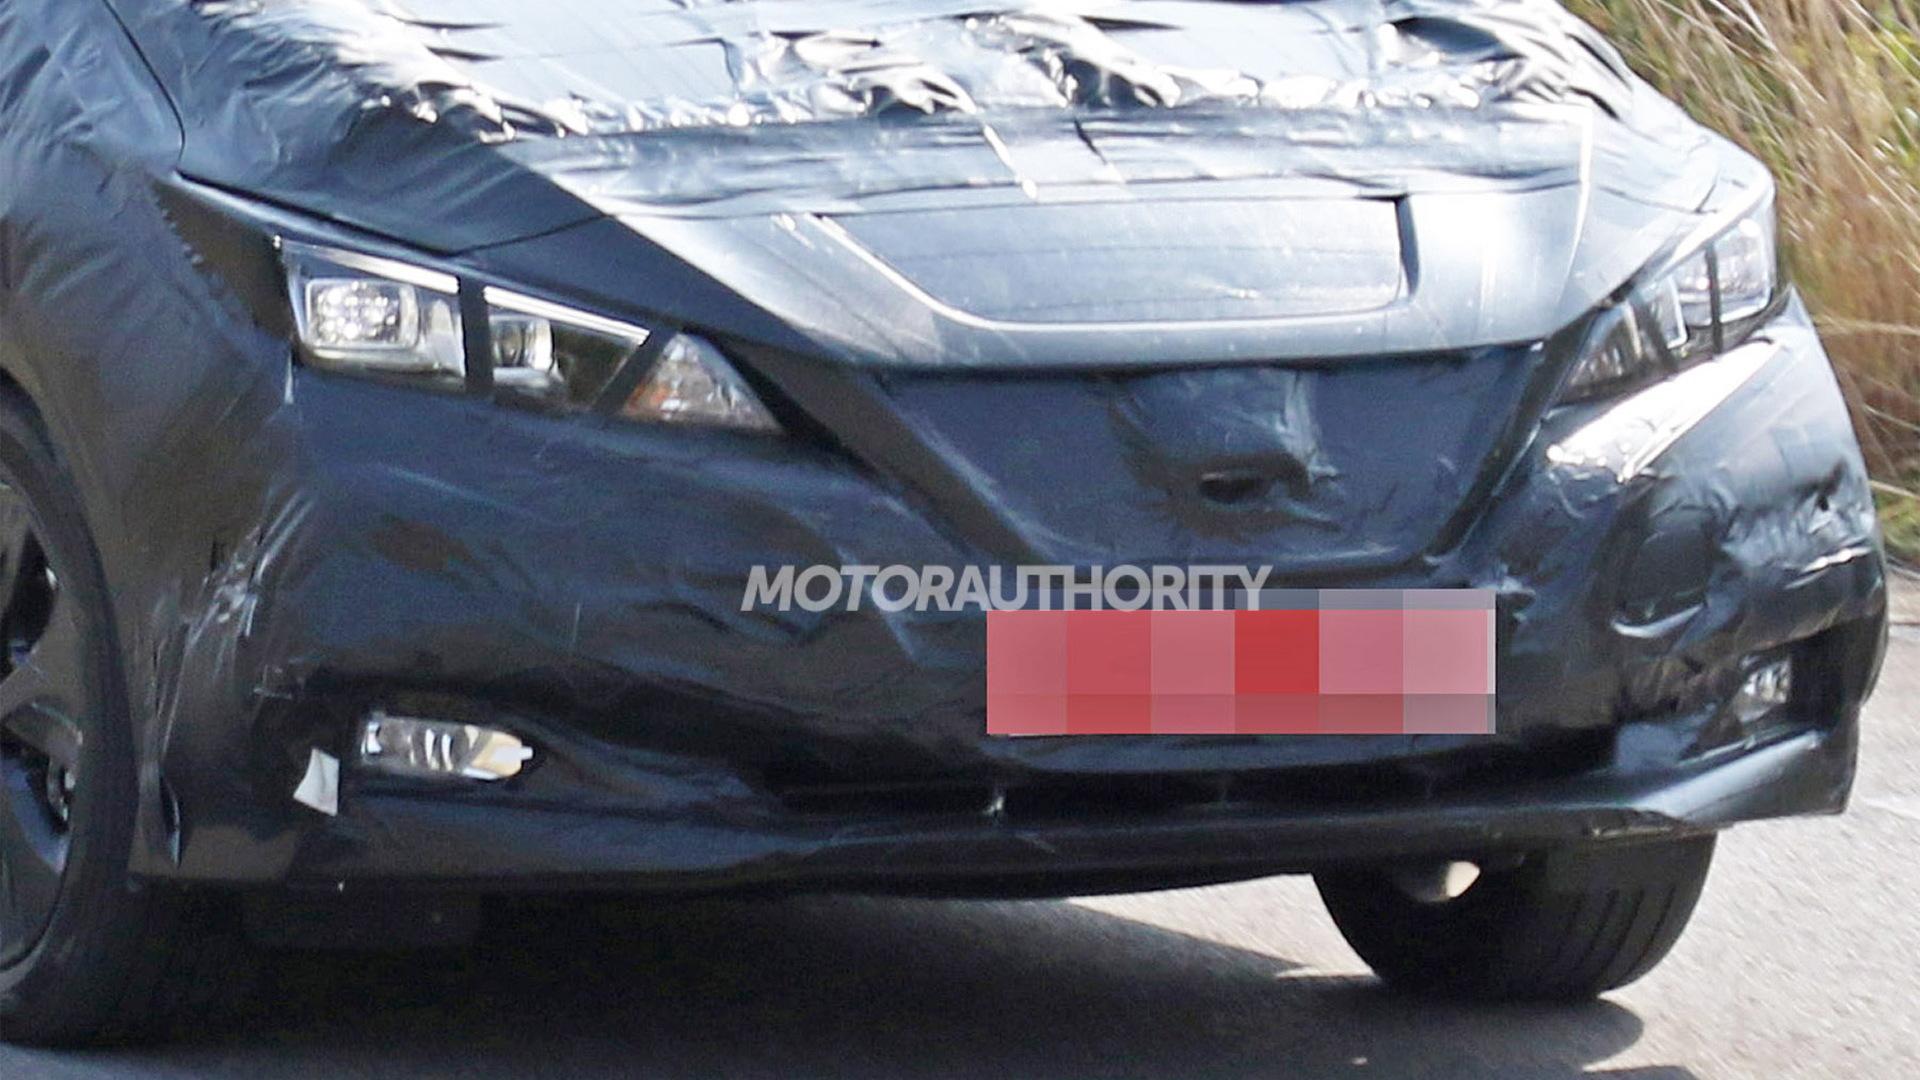 2018 Nissan Leaf spy shots - Image via S. Baldauf/SB-Medien